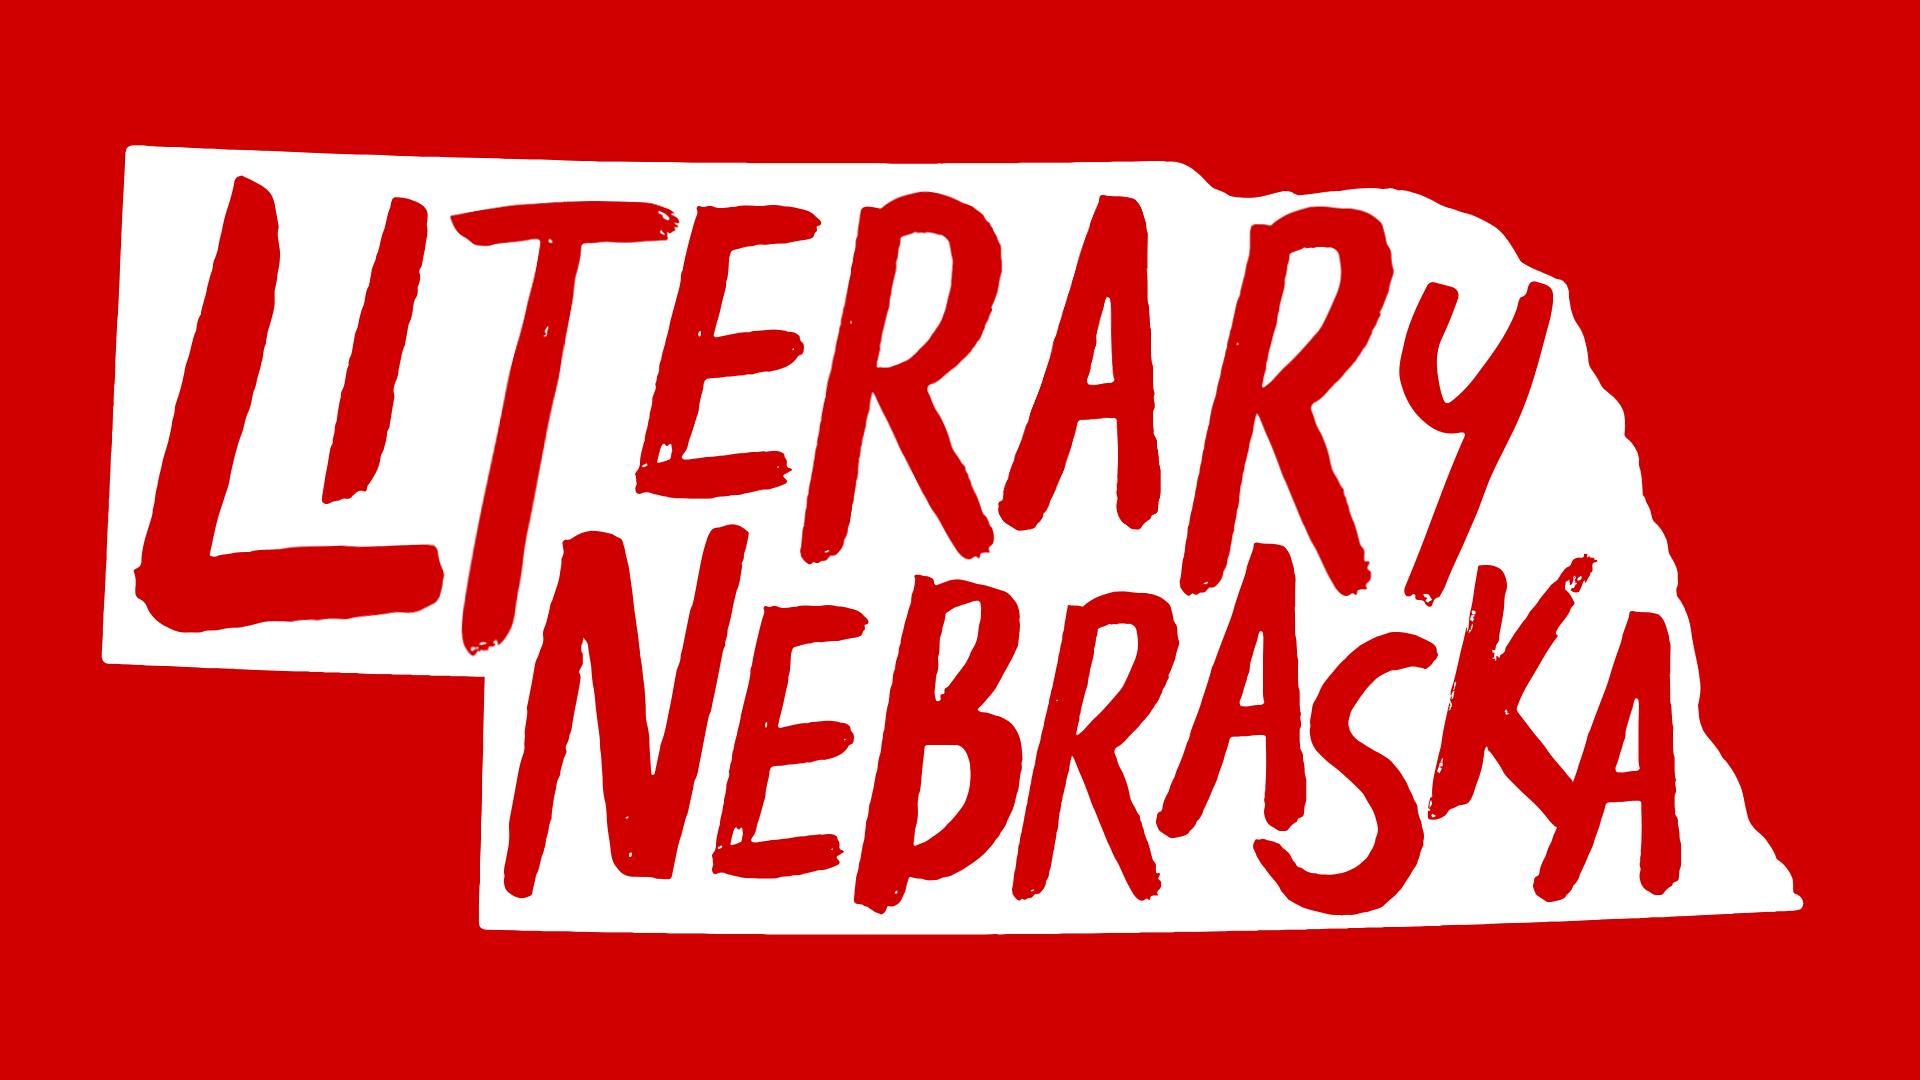 Literary Nebraska Image